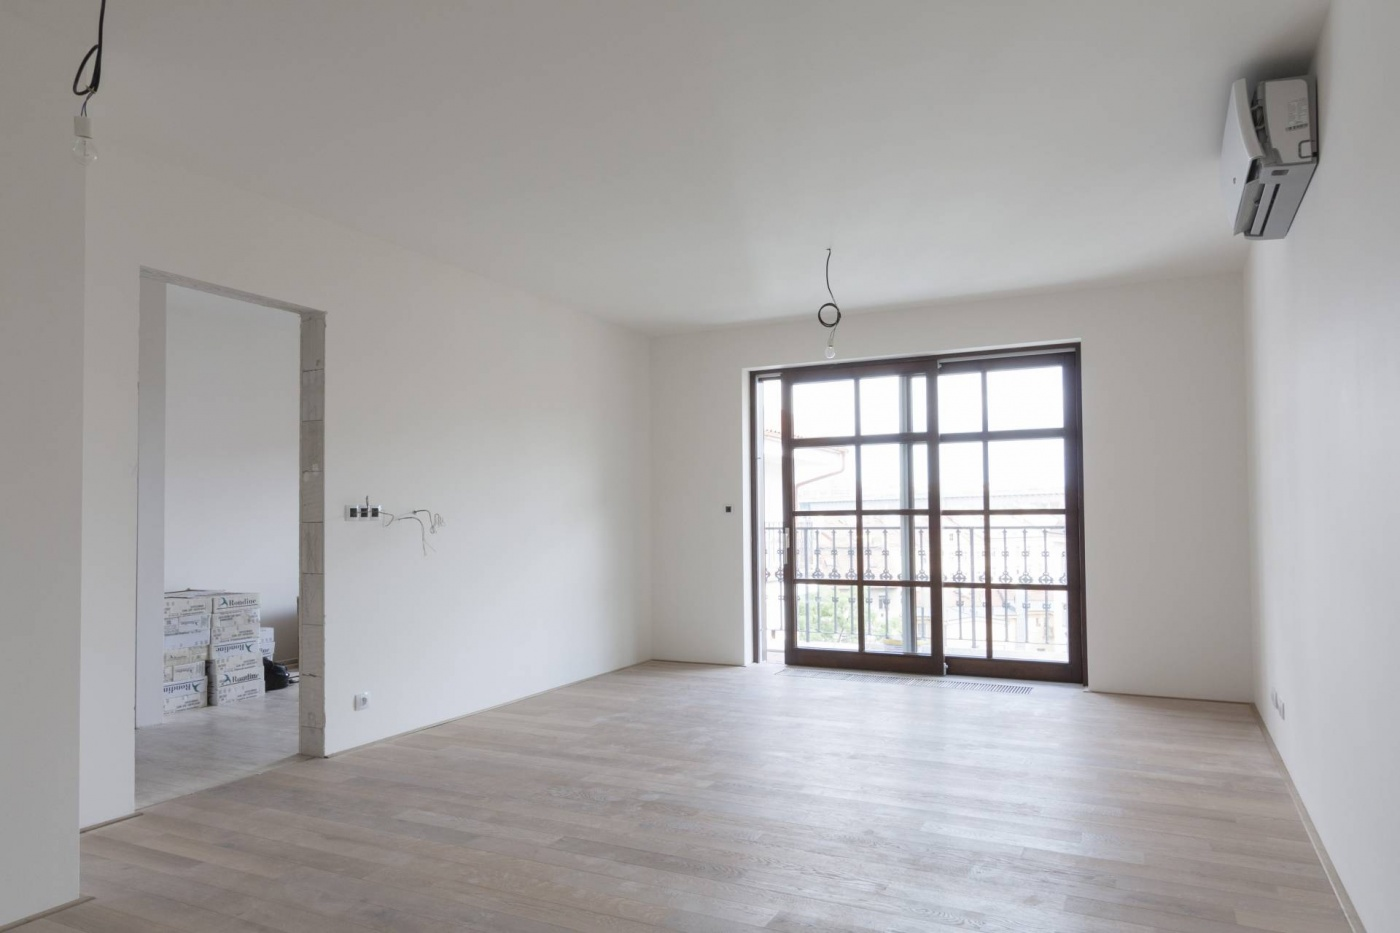 Půdní byt 2+kk, plocha 79 m², ulice Lumírova, Praha 2 - Vyšehrad, cena 7 490 000 Kč | 1